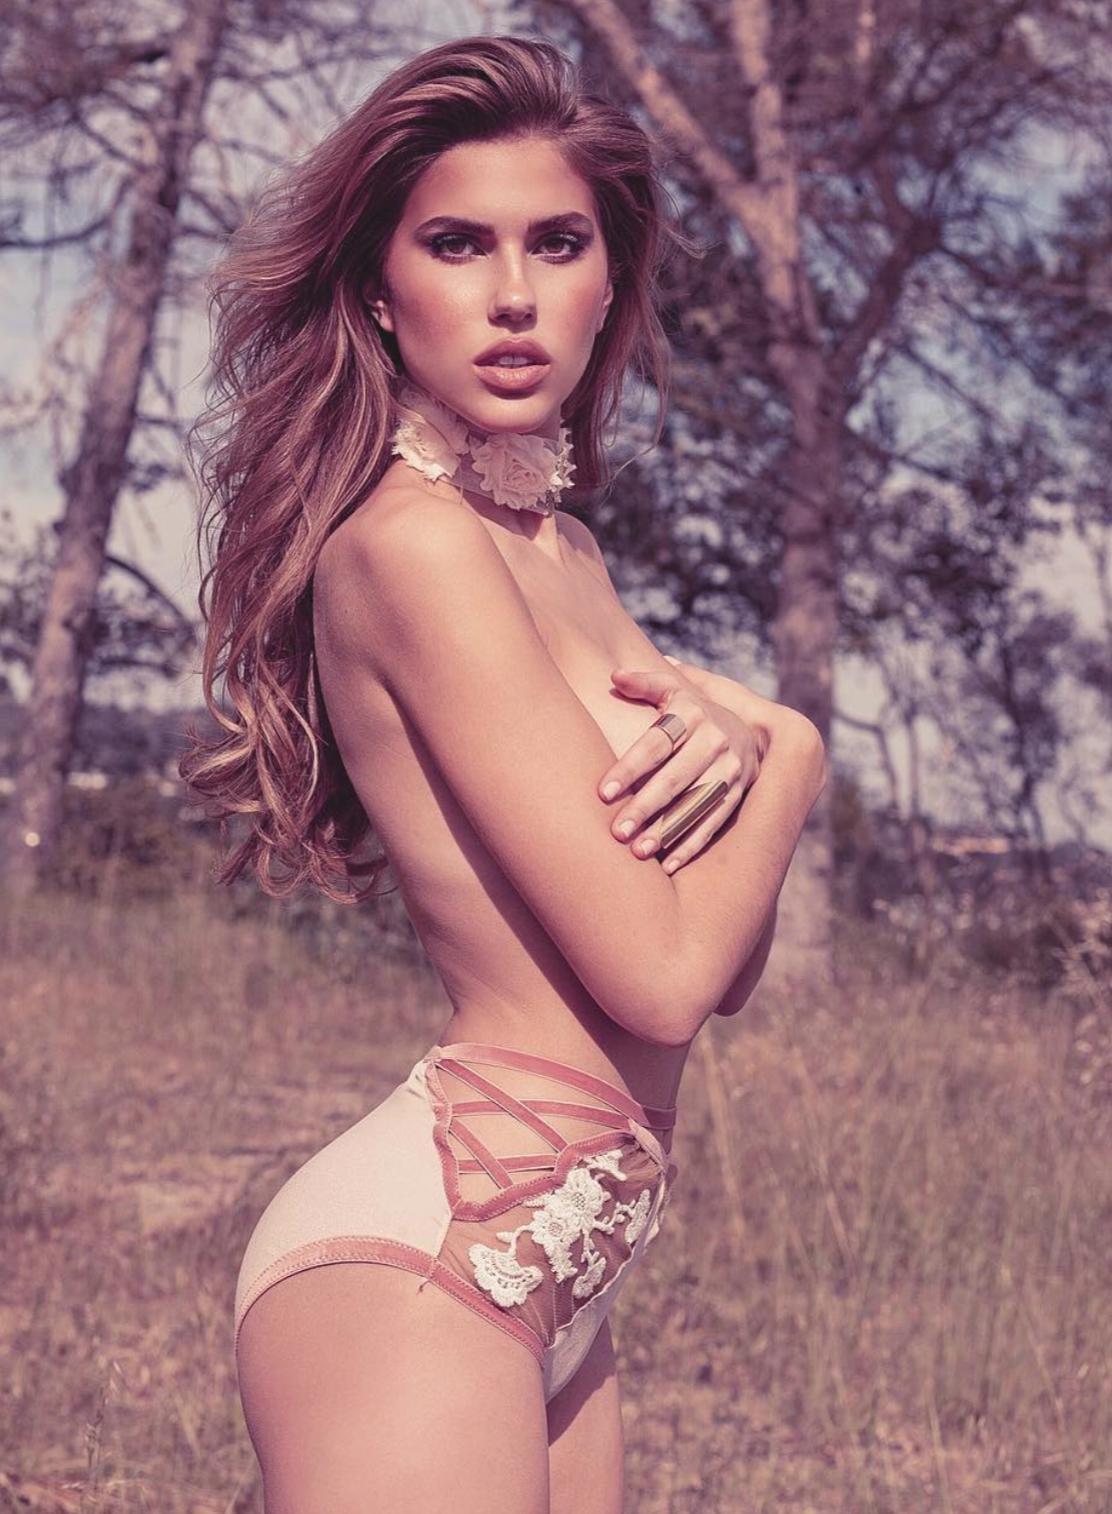 nudes (93 photos), Sexy Celebrity fotos